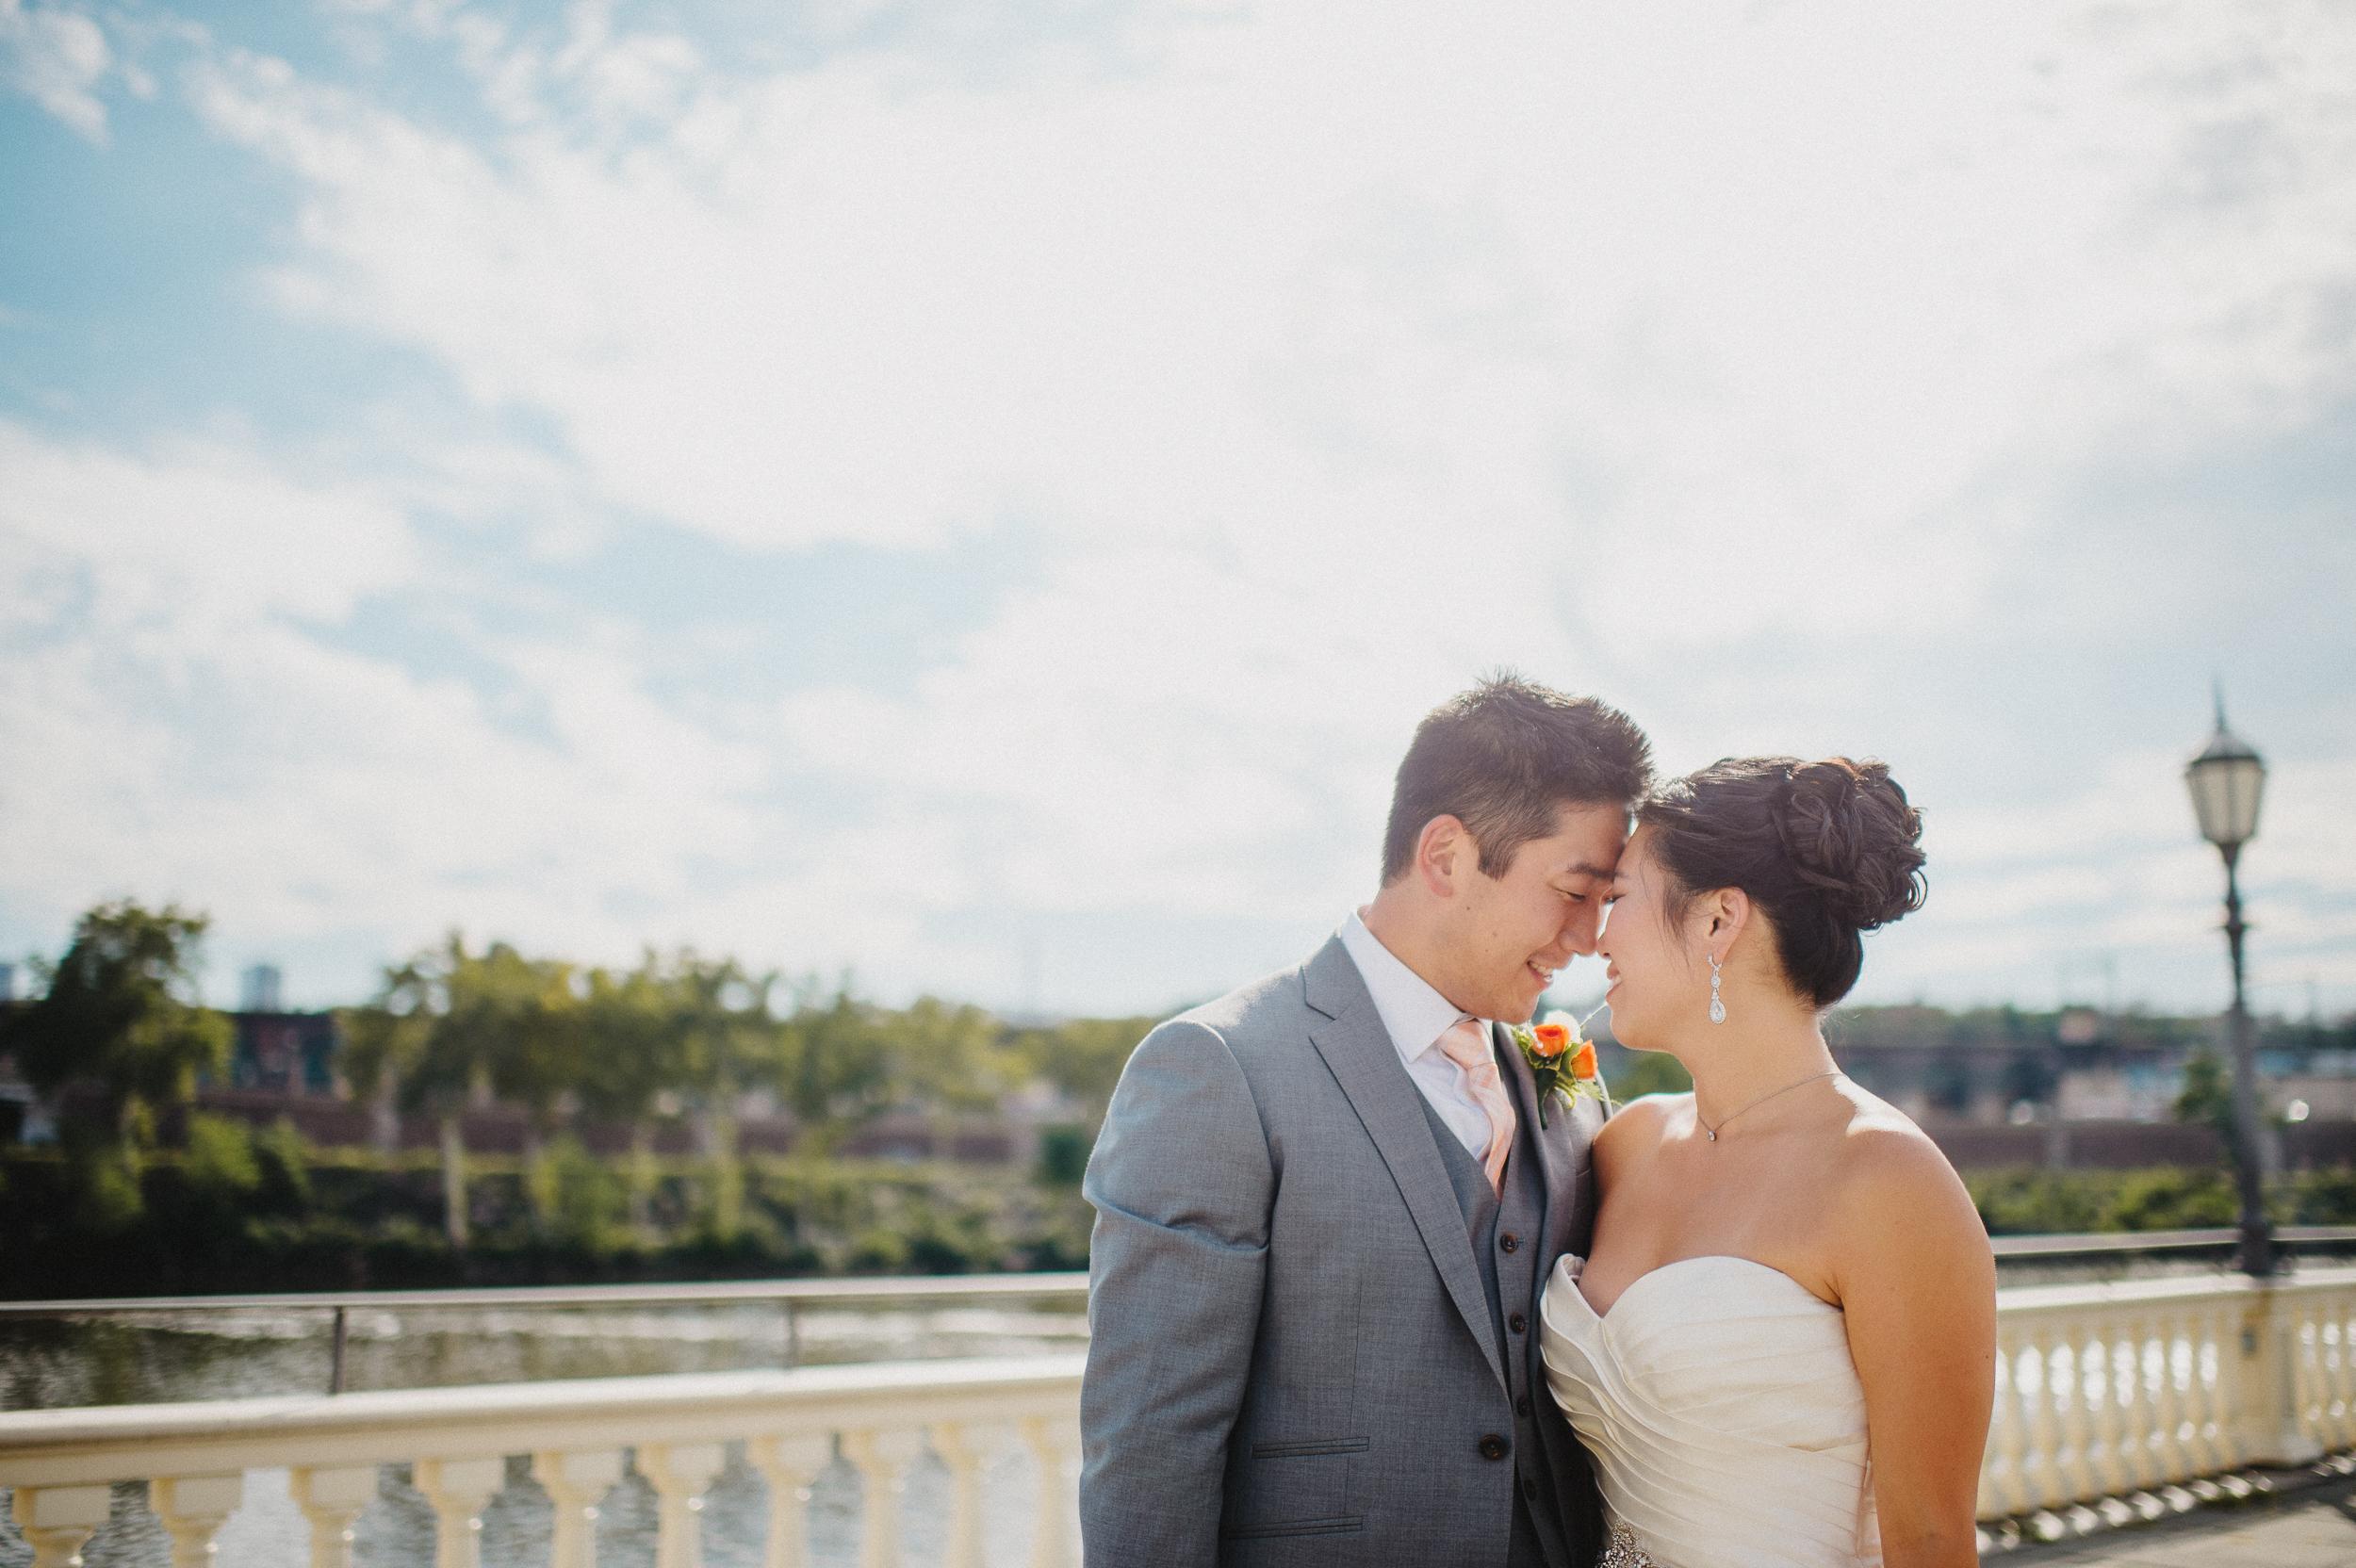 union-trust-philadelphia-wedding-photographer-49.jpg